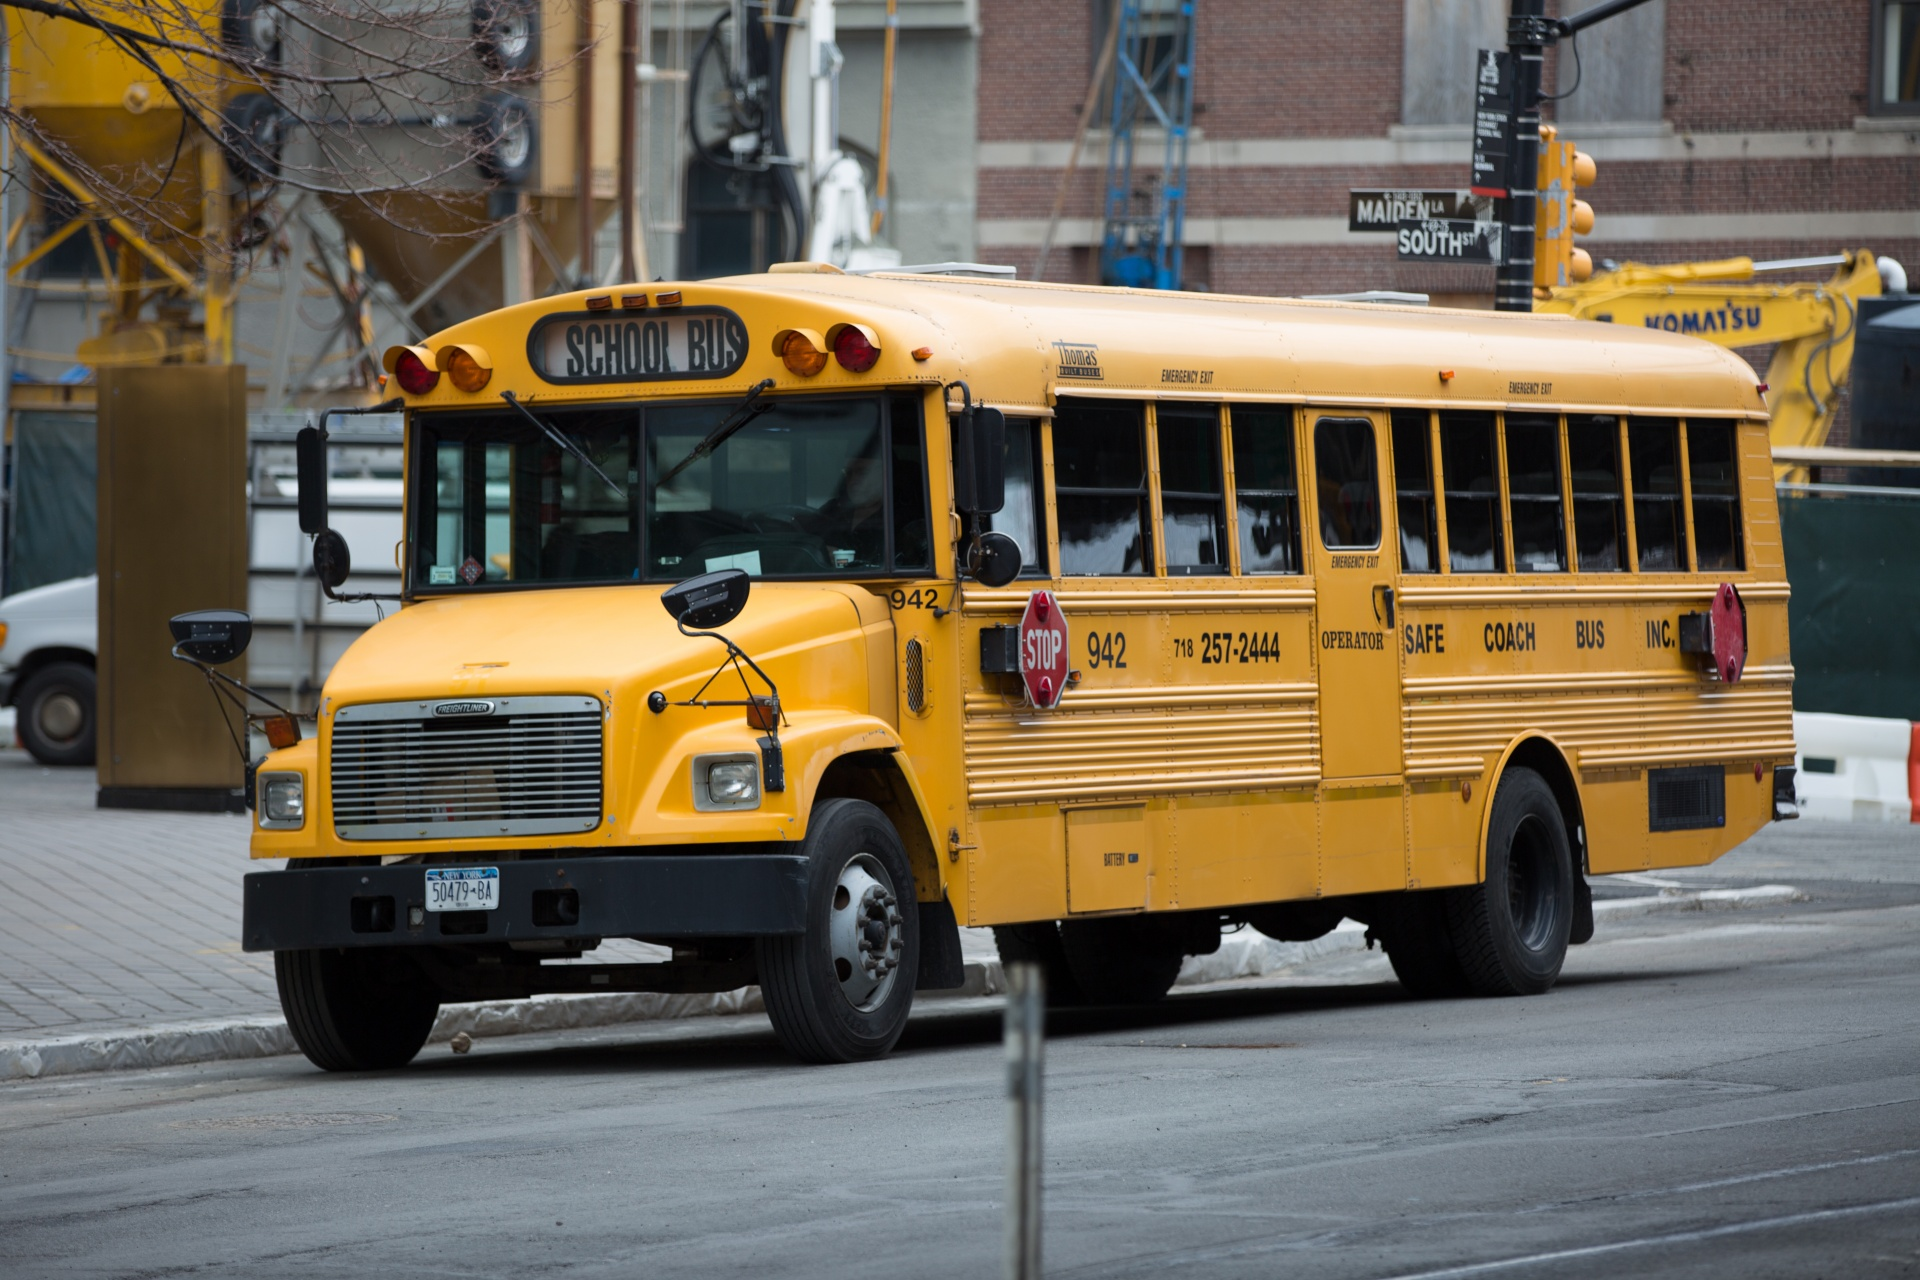 Back to School, School Bus, School